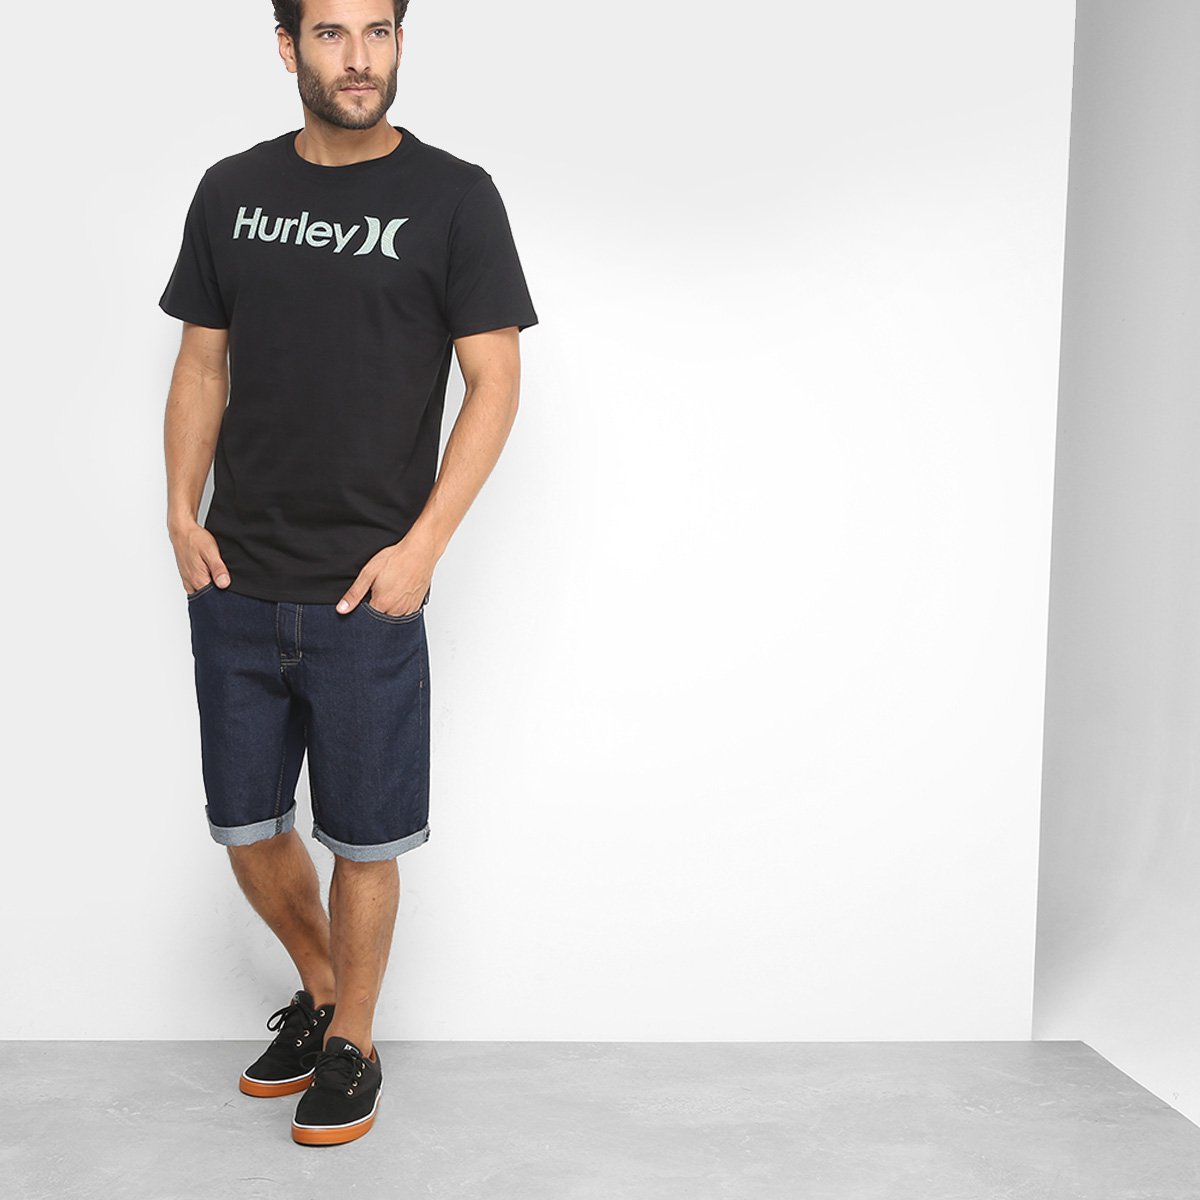 Camiseta Hurley Silk O O Cross Winds Masculina - Compre Agora  98955f7080fd9